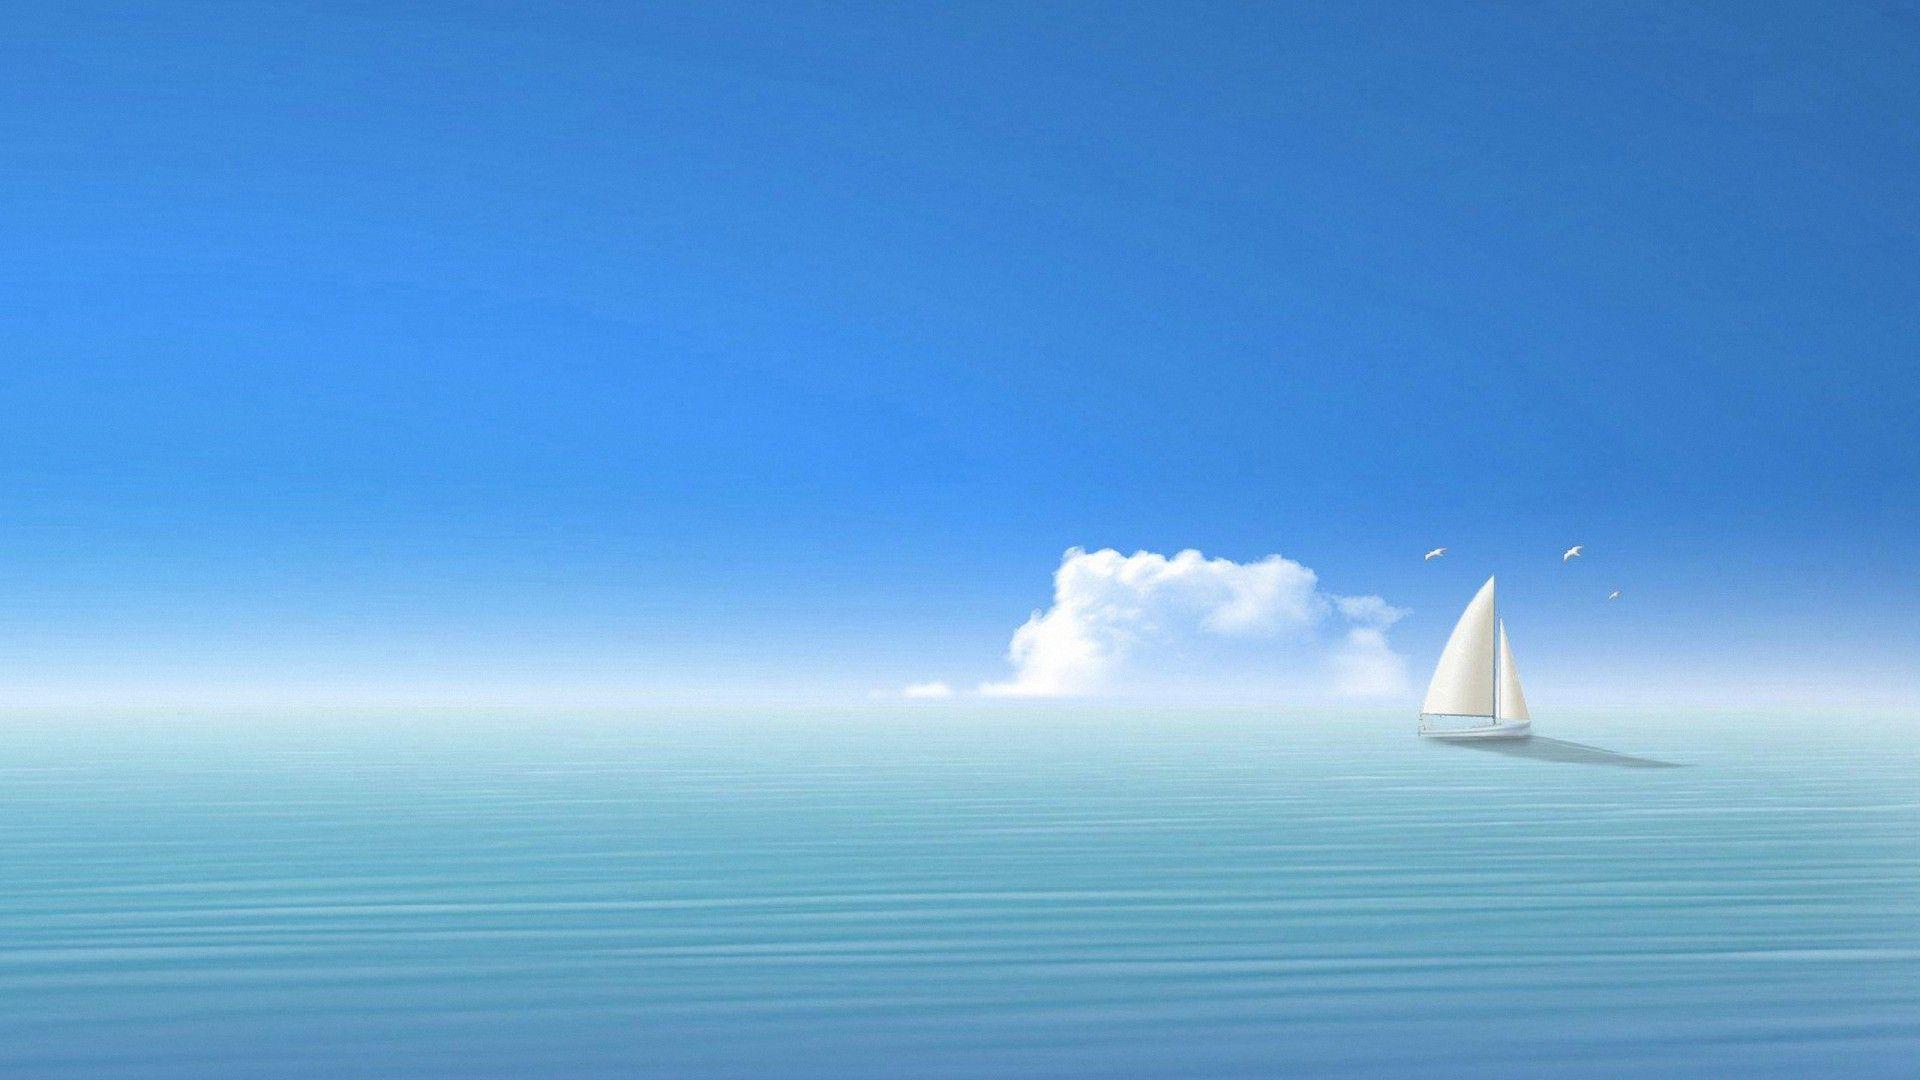 Cute Ship Sea Wallpapers Full Hd Backgrounds Digital